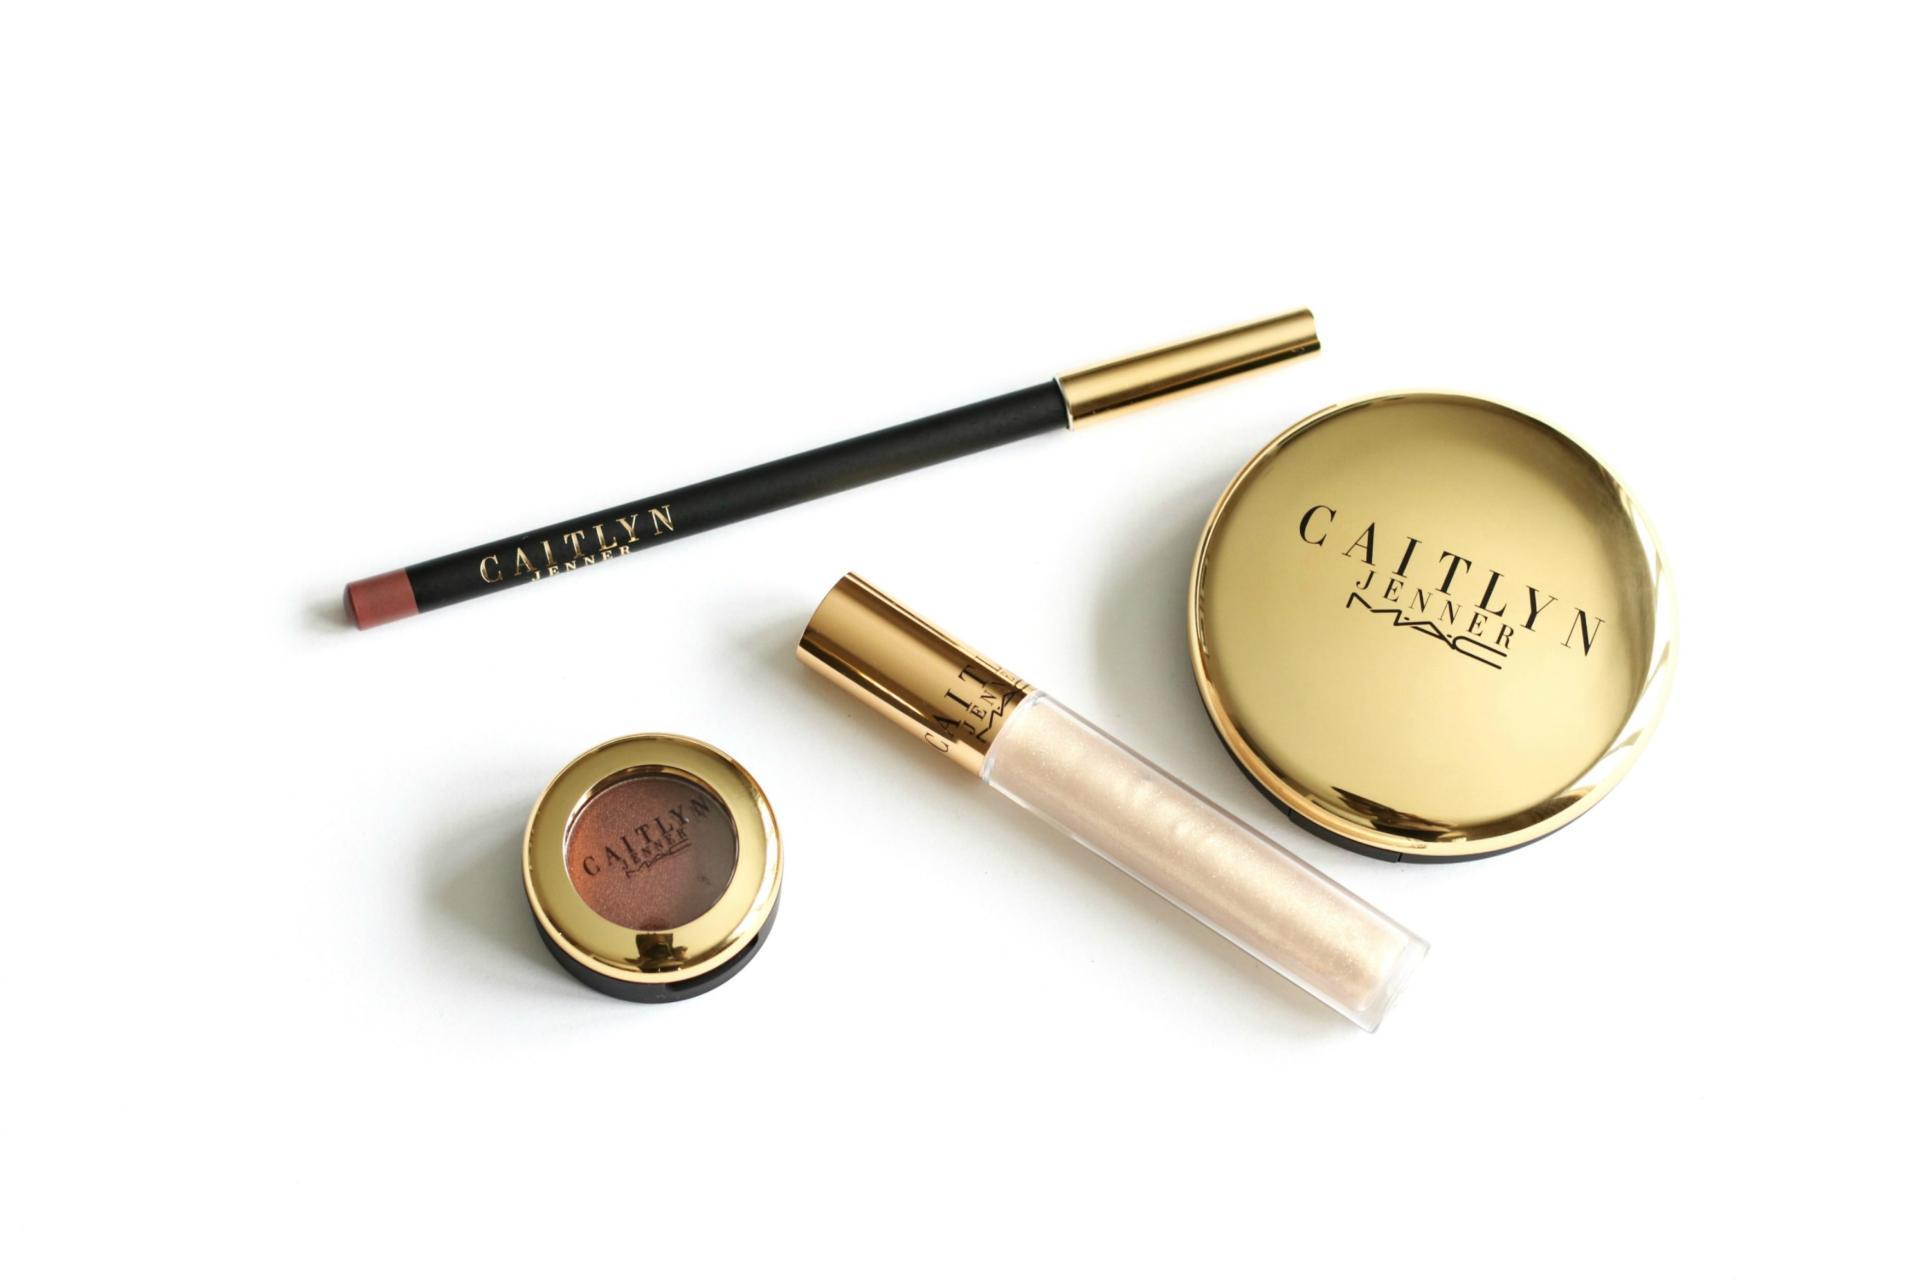 MAC Cosmetics x Caitlyn Jenner 2017